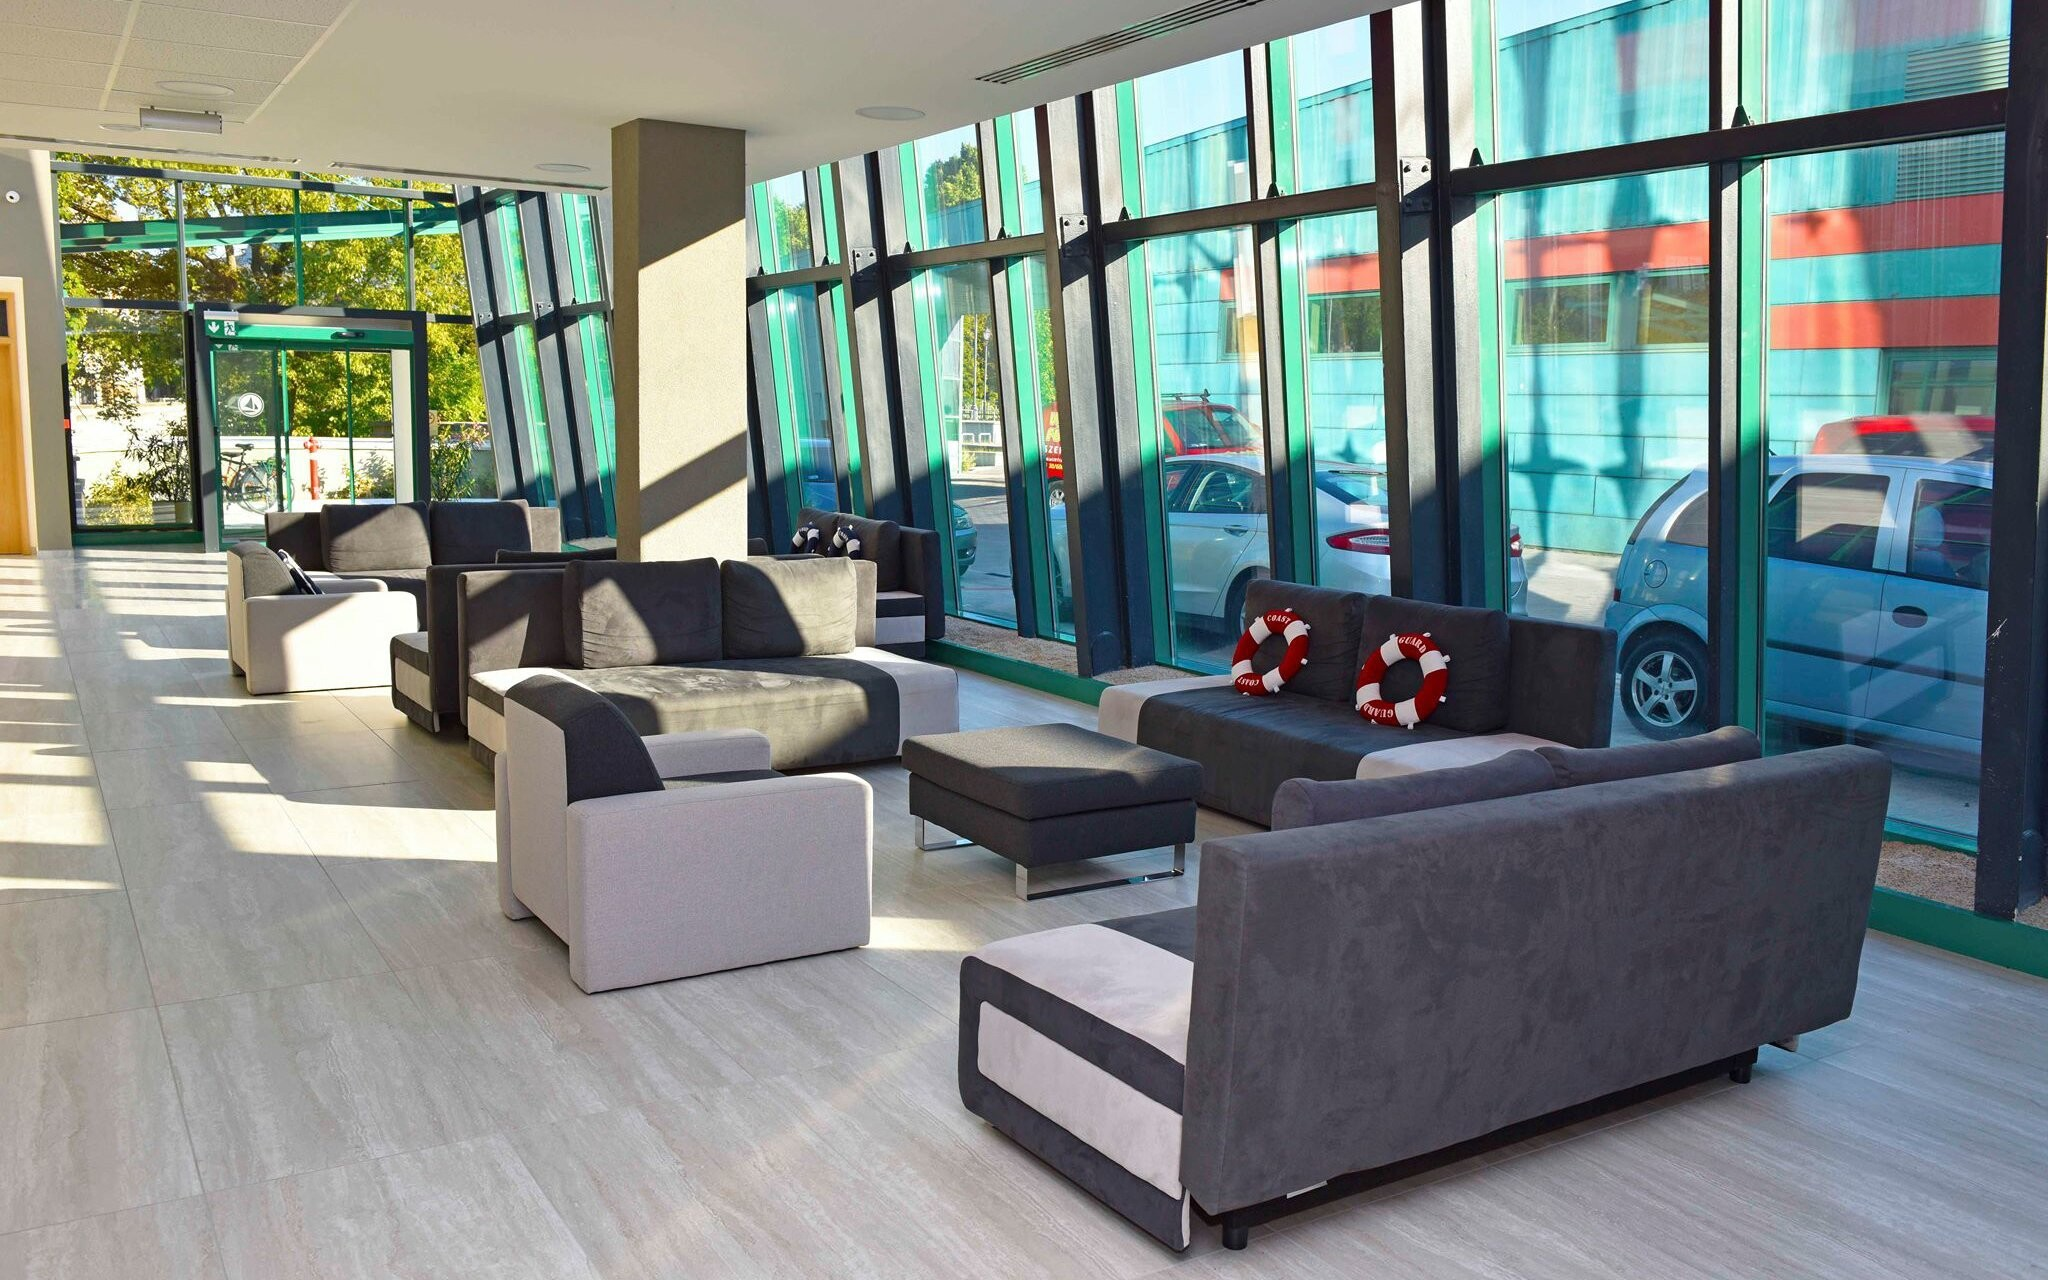 Luxusné interiéry hotela